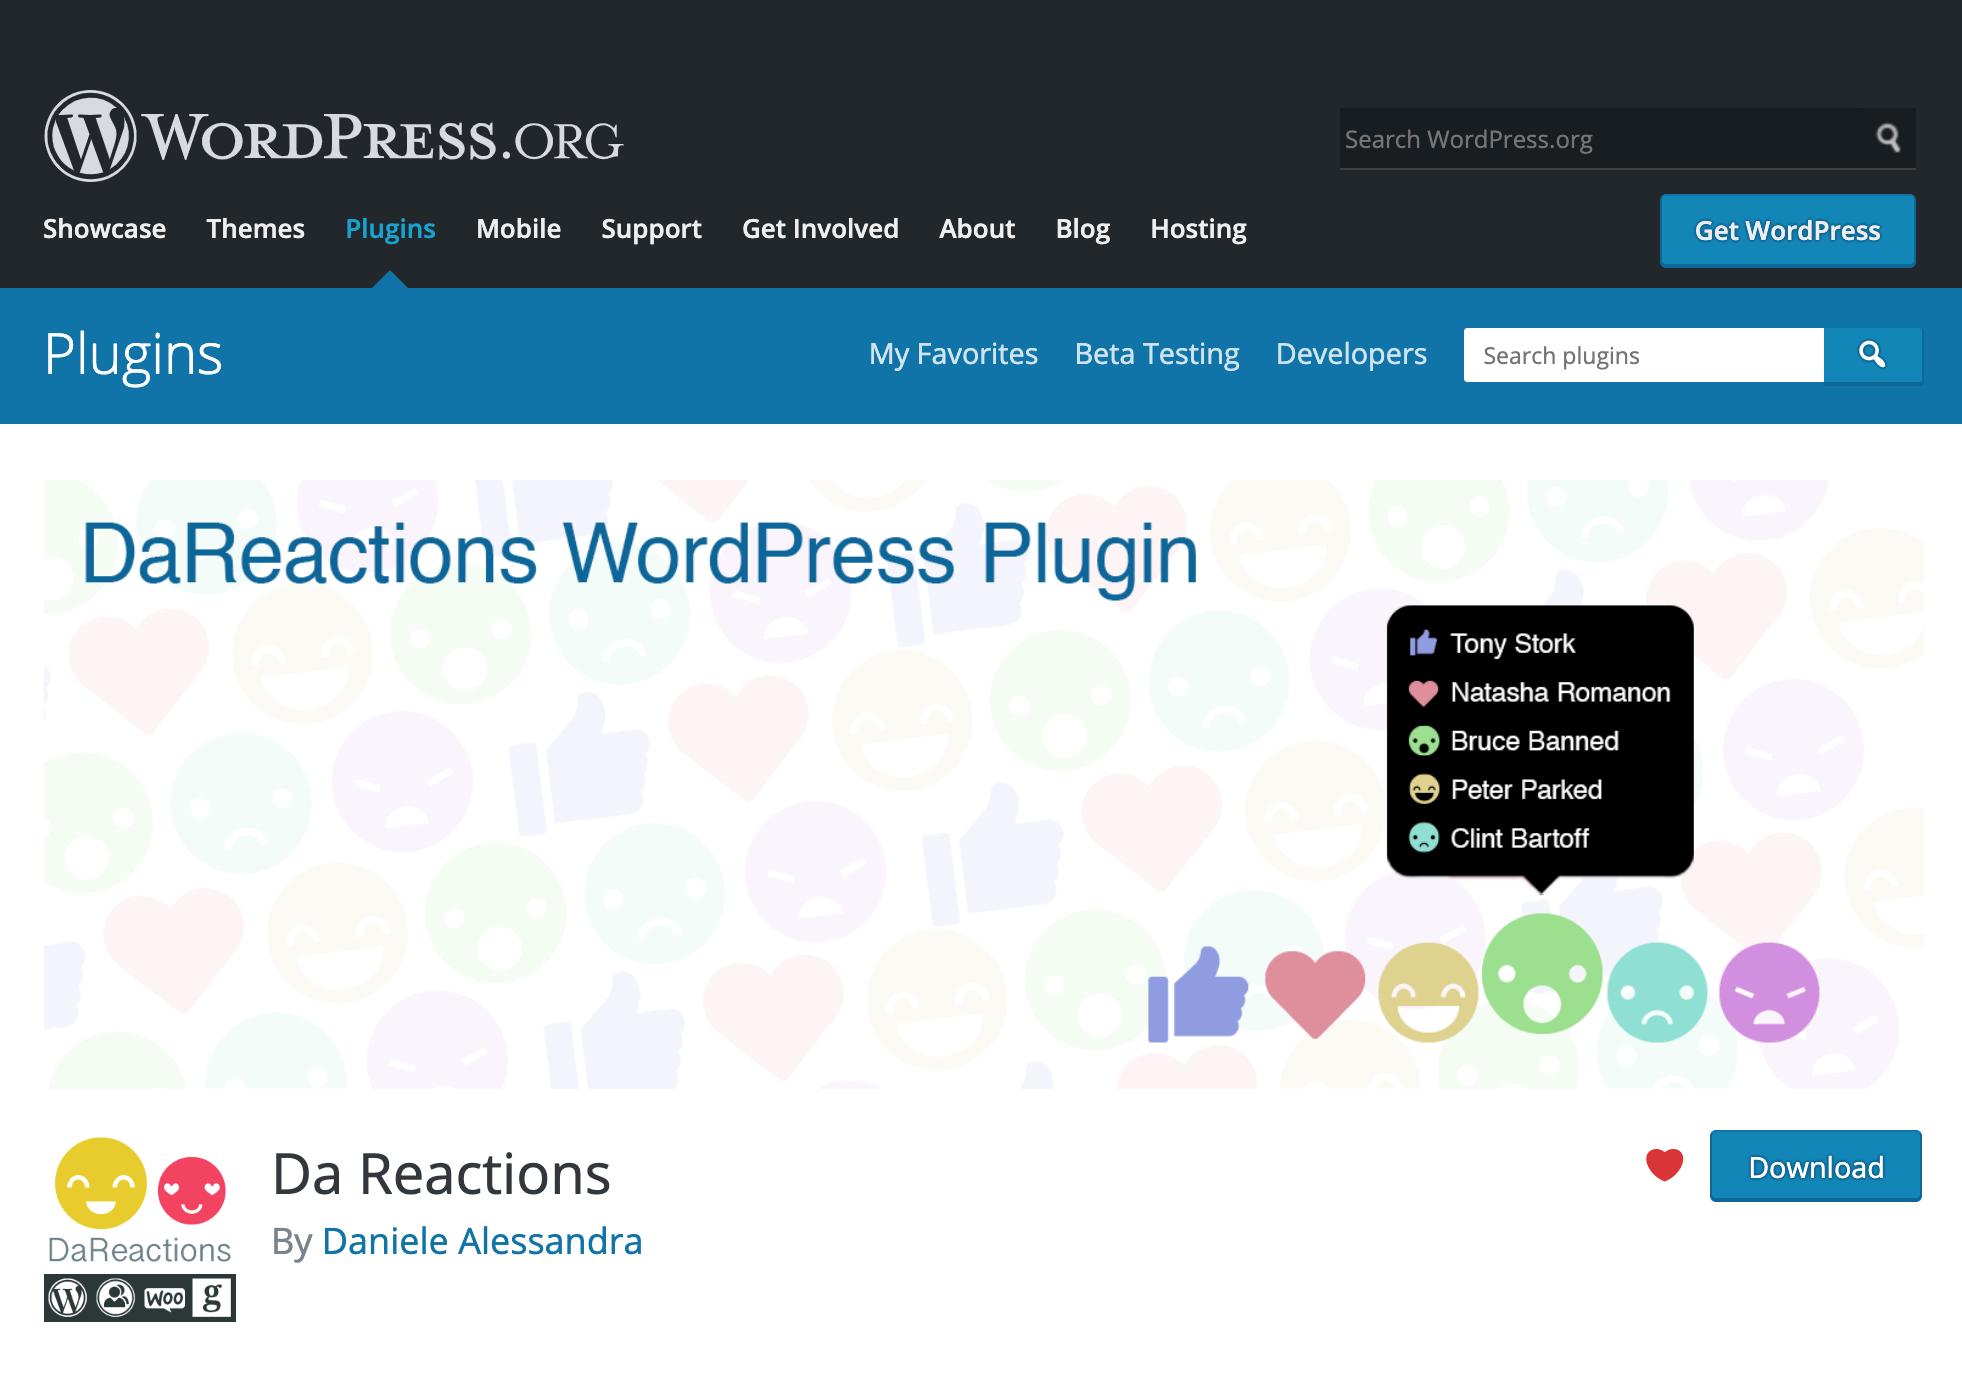 DaReactions screen on WordPress.org